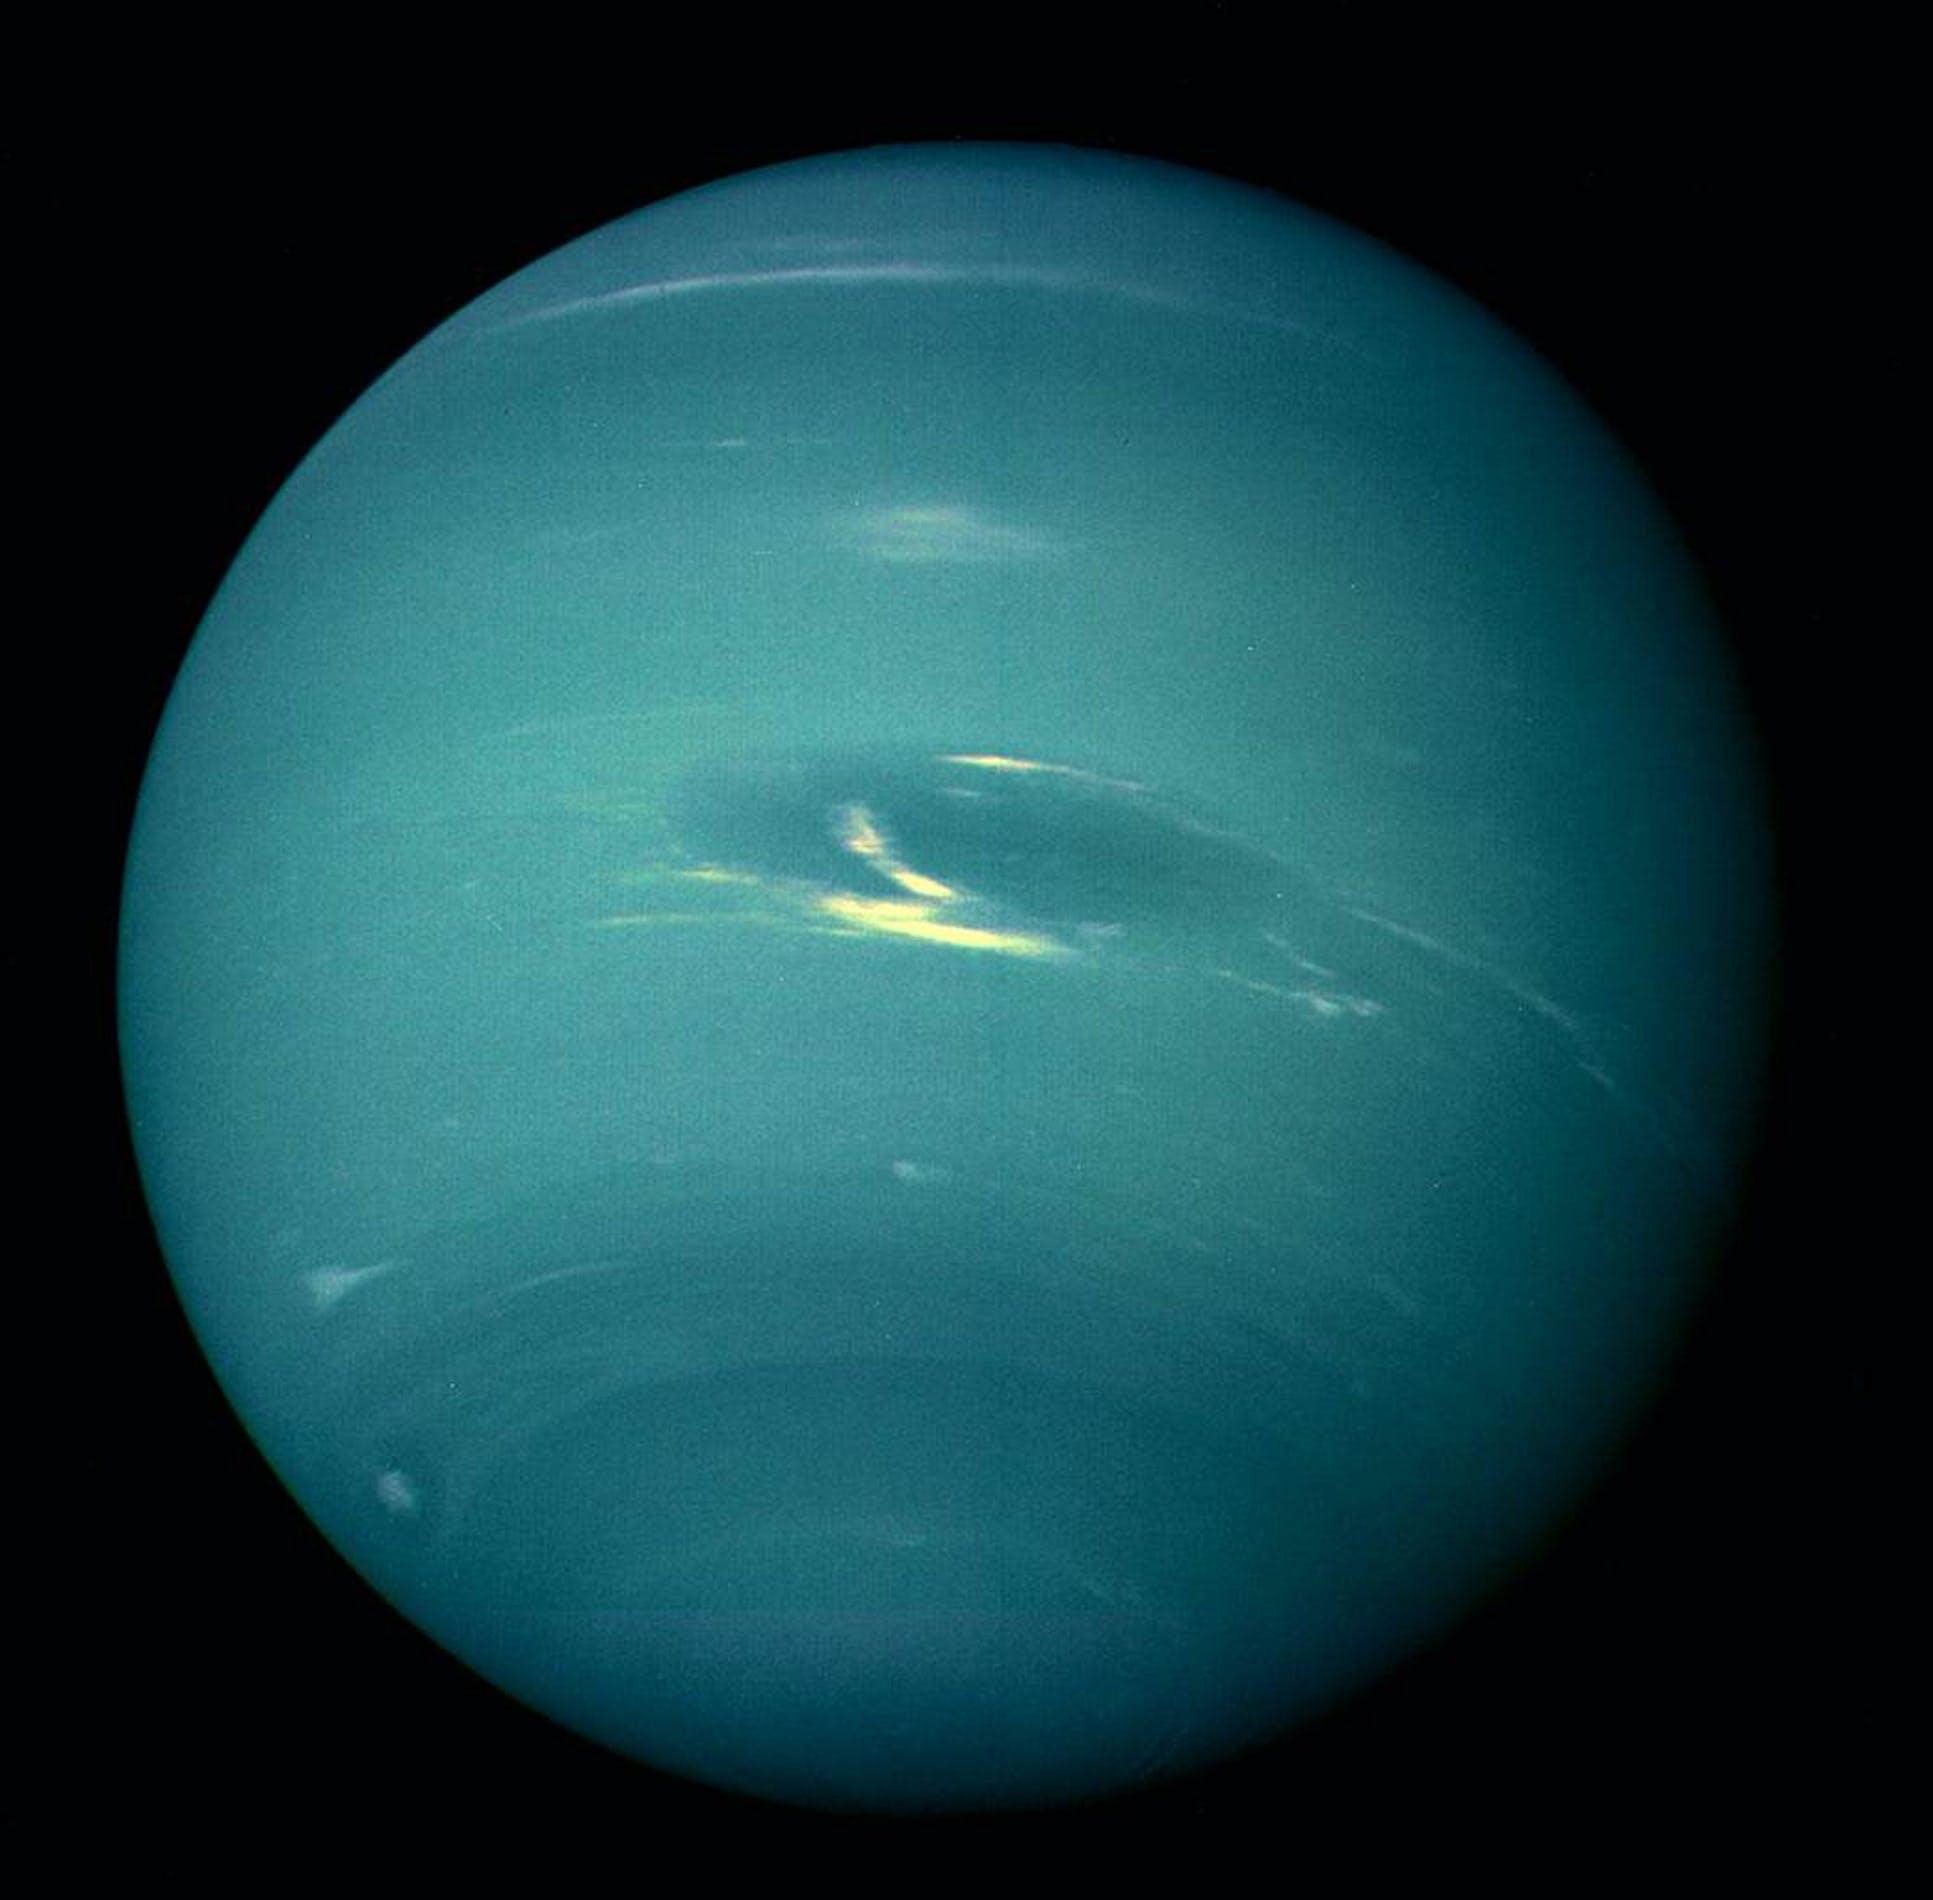 Voyager neptun